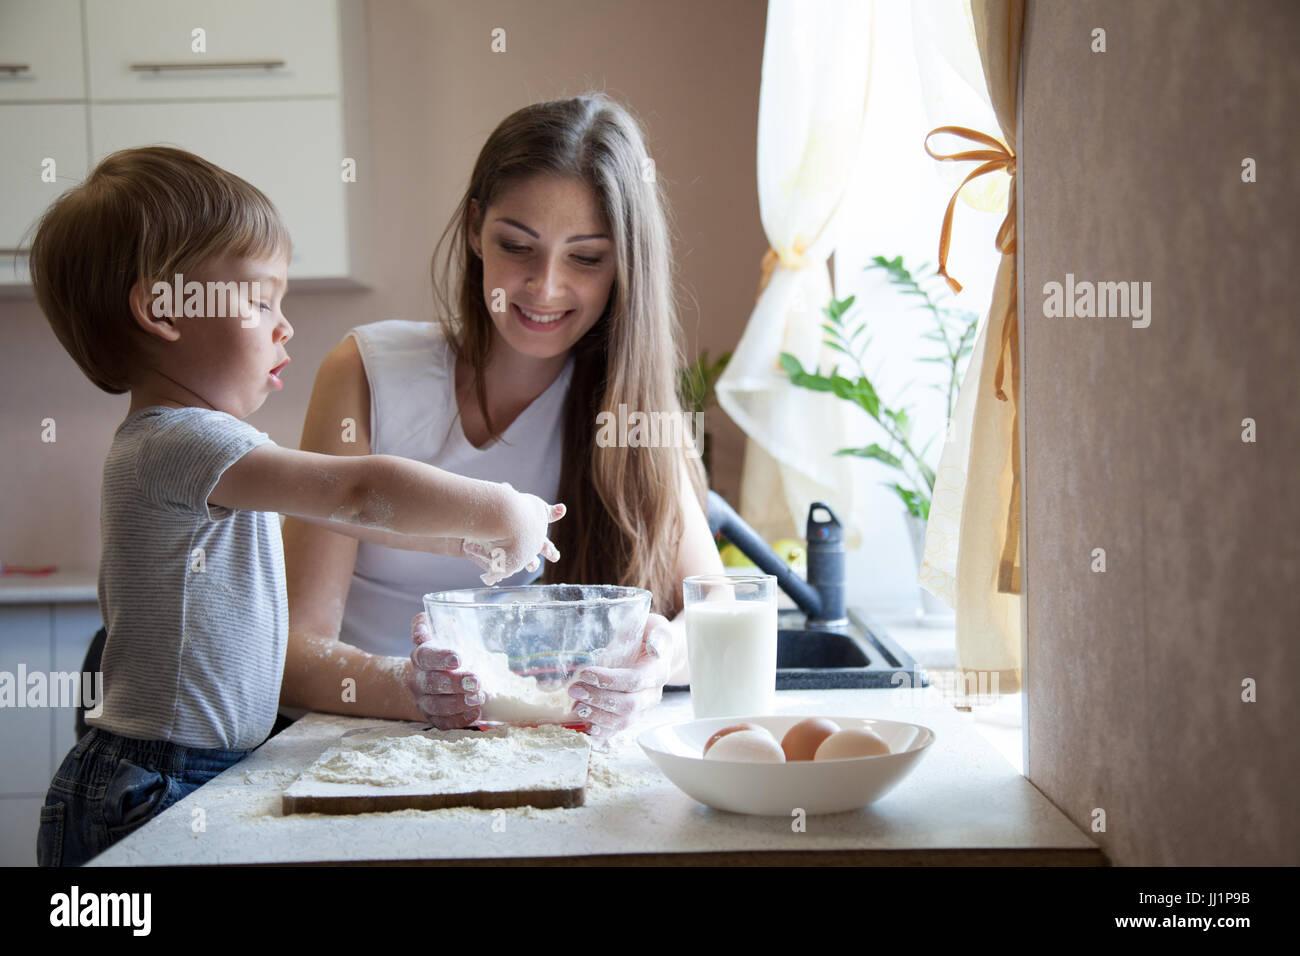 Madre e hijo preparar tarta con harina Imagen De Stock